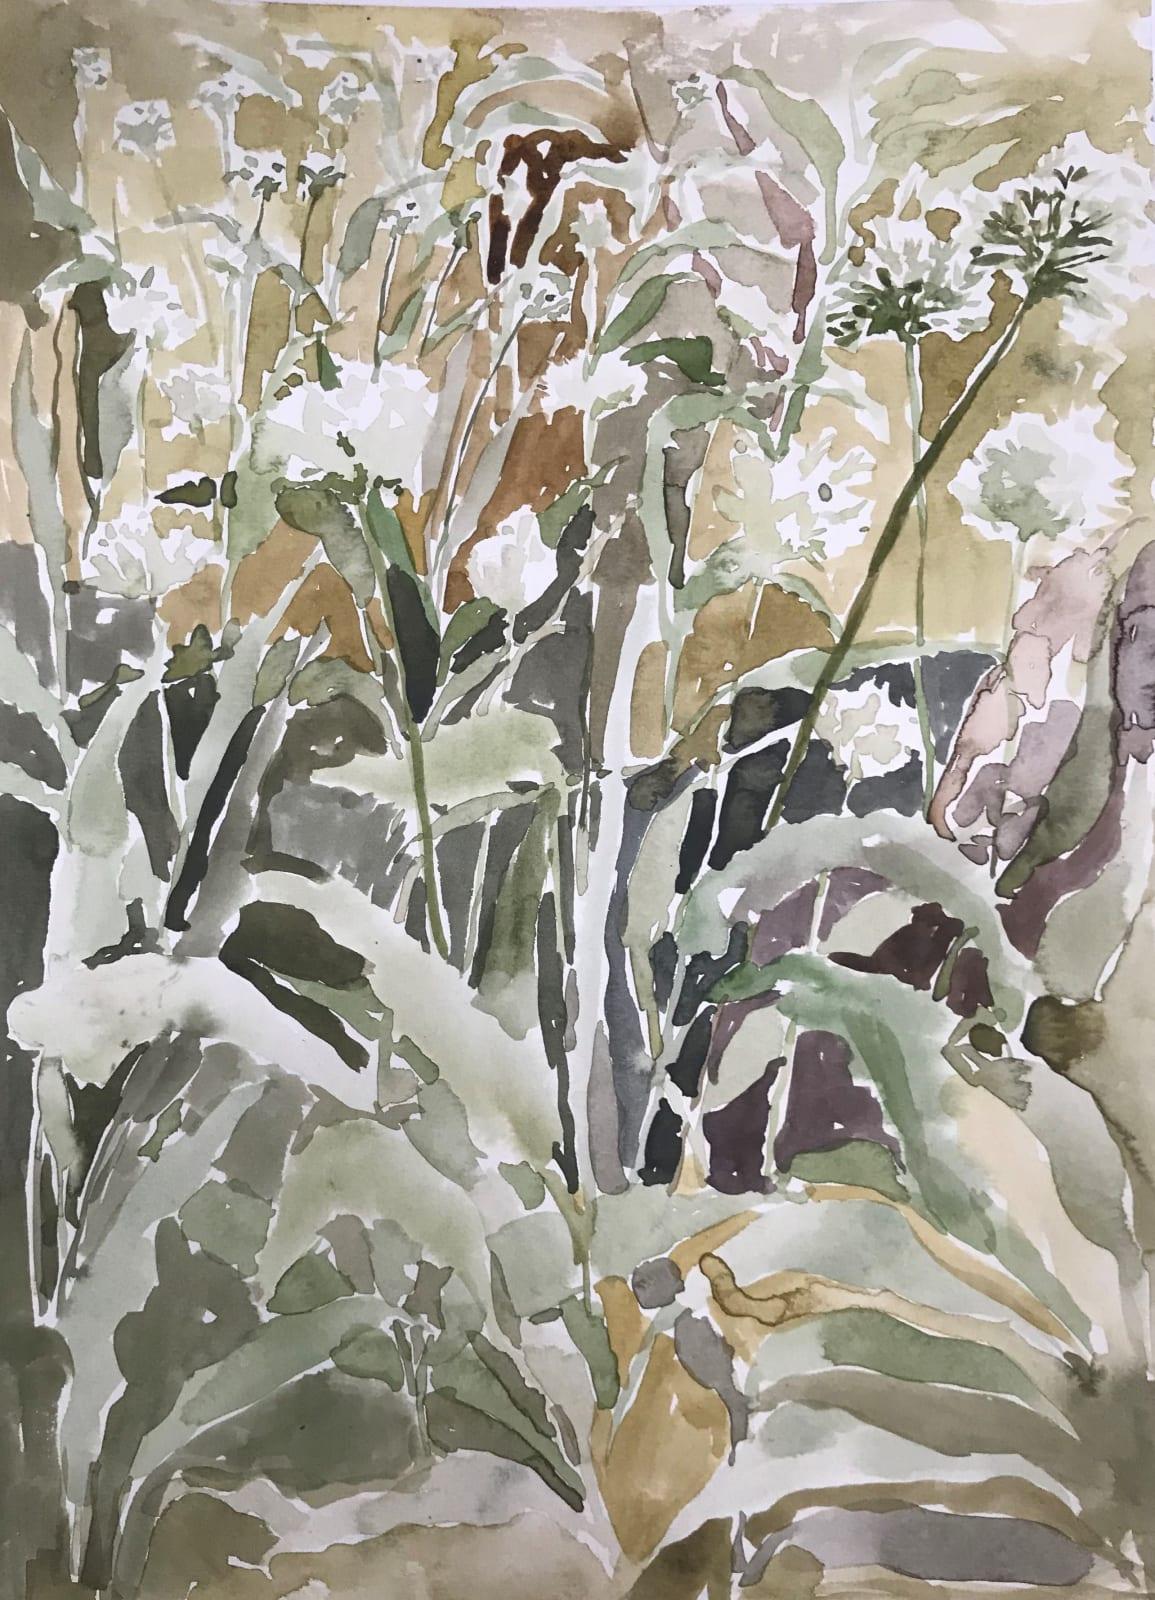 Beatrice Hasell McCosh, Wild Garlic Study